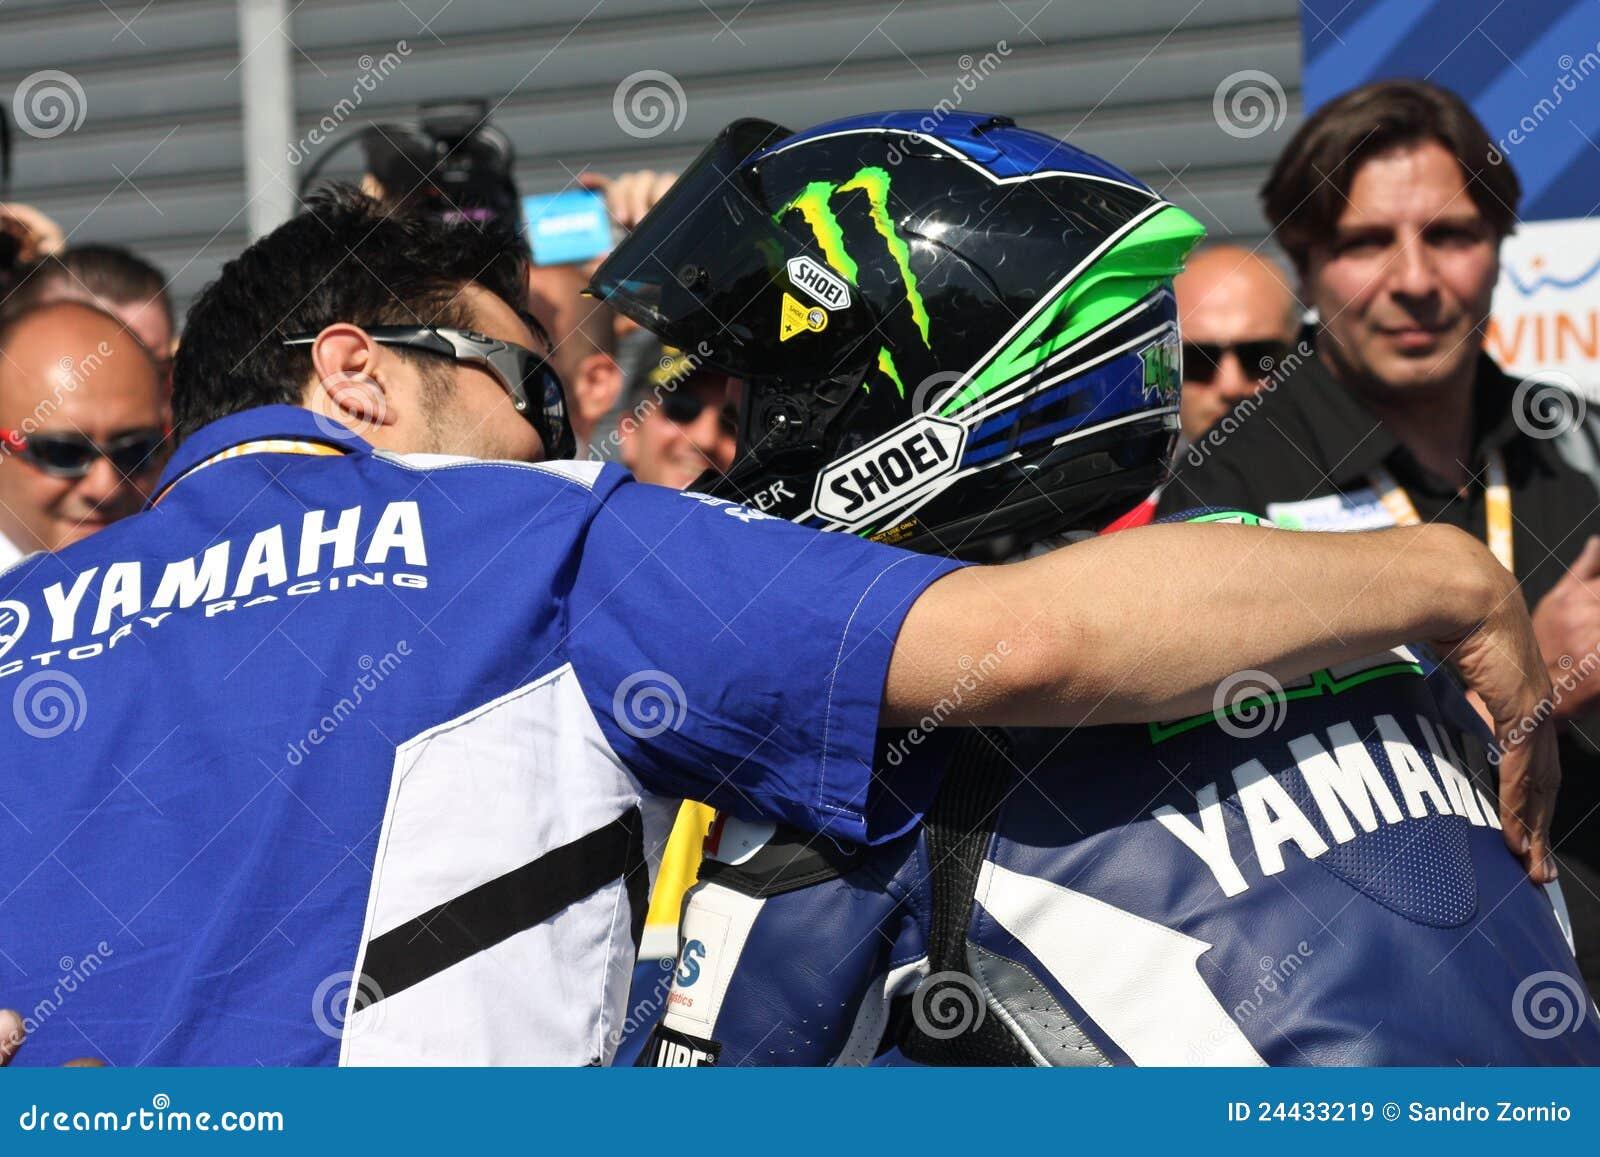 Chaz Davies Yamaha R6 Supersport champion